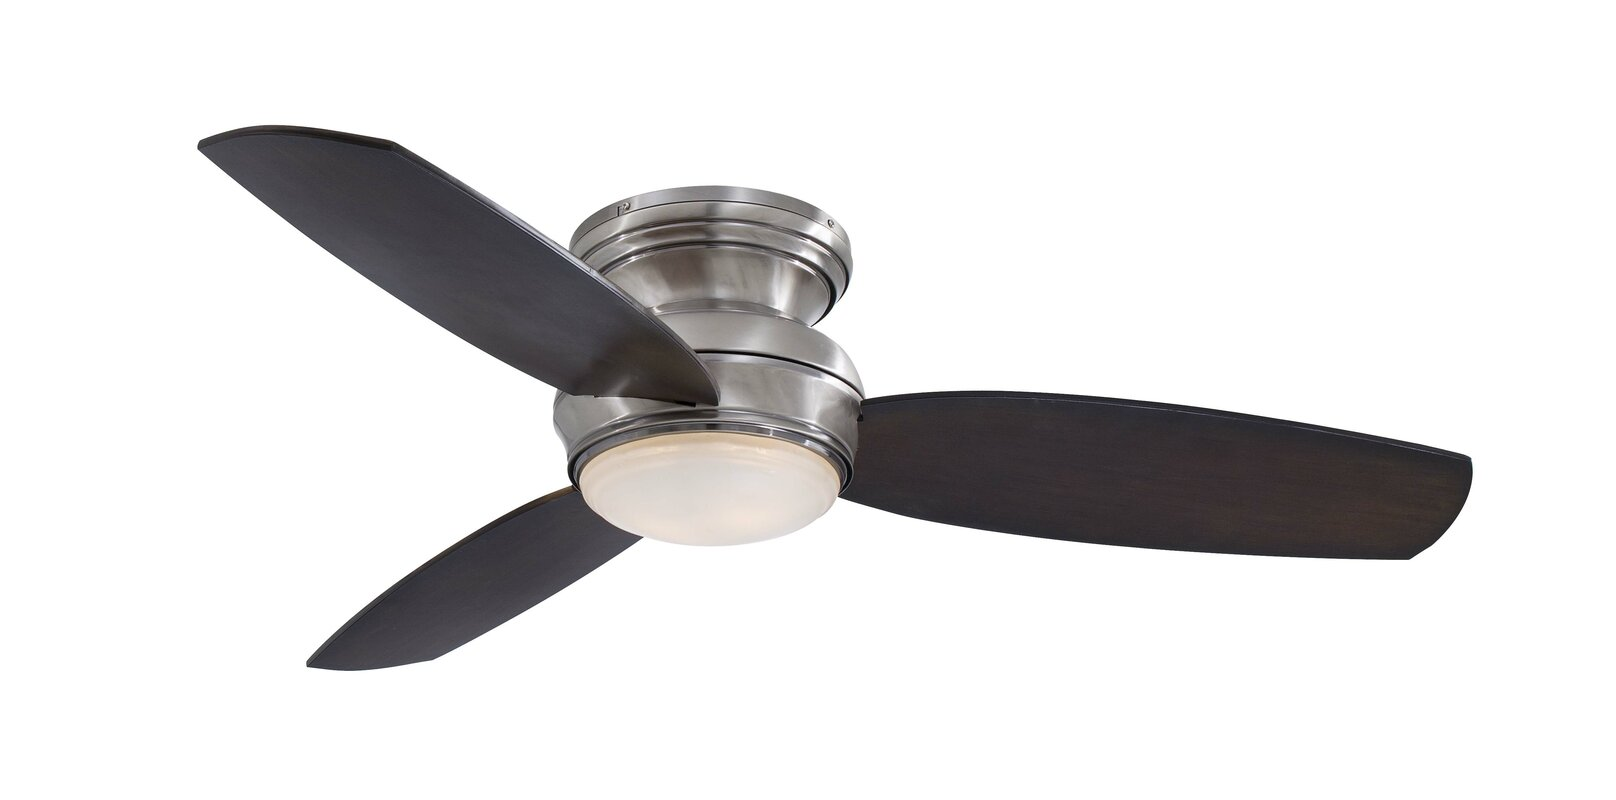 minka aire  traditional concept blade flush mount ceiling fan  - defaultname